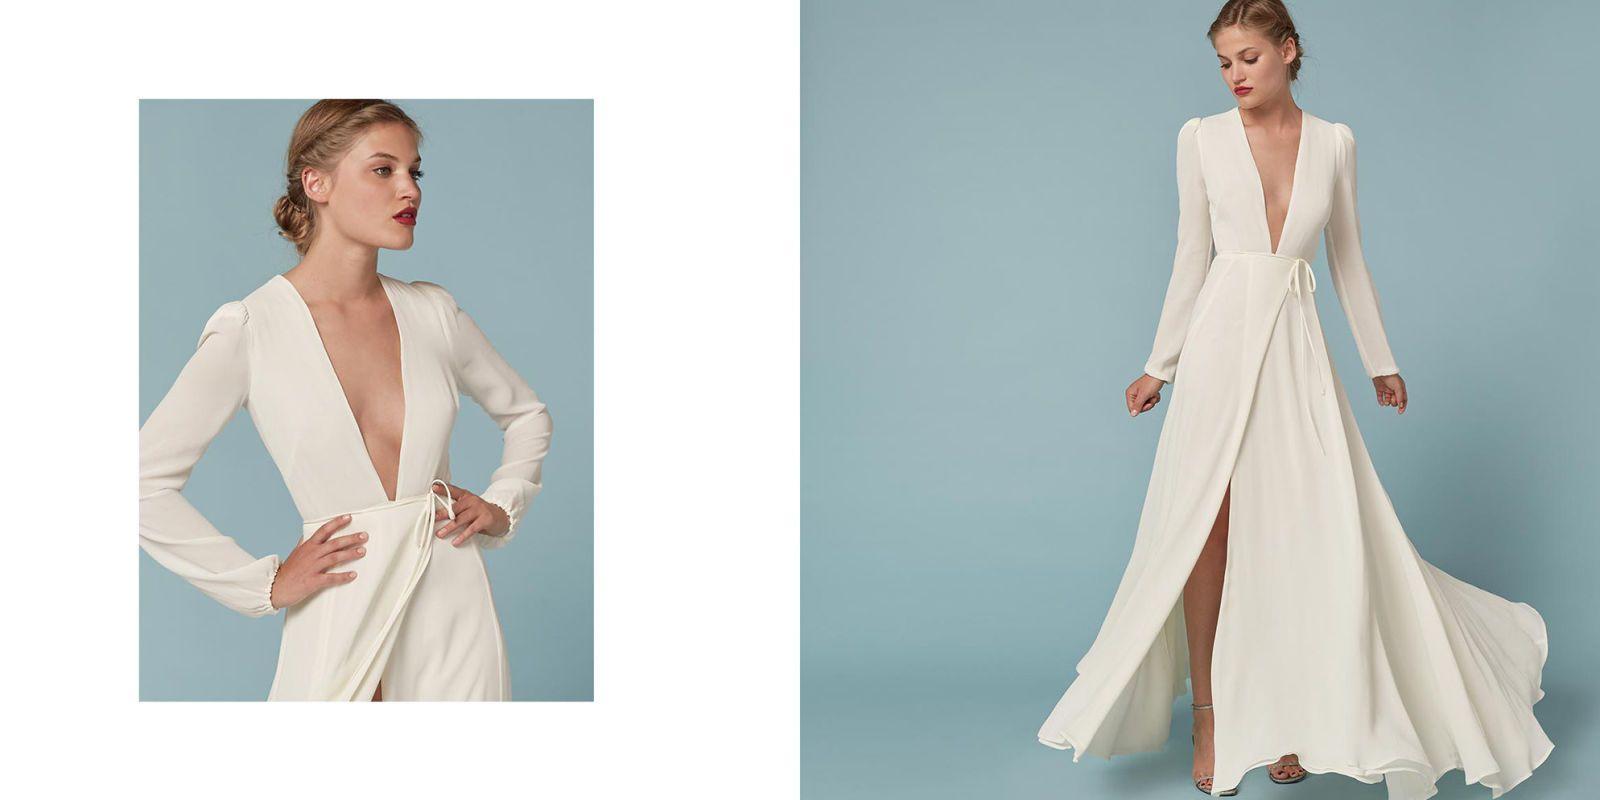 2018 Winter Wedding Dress